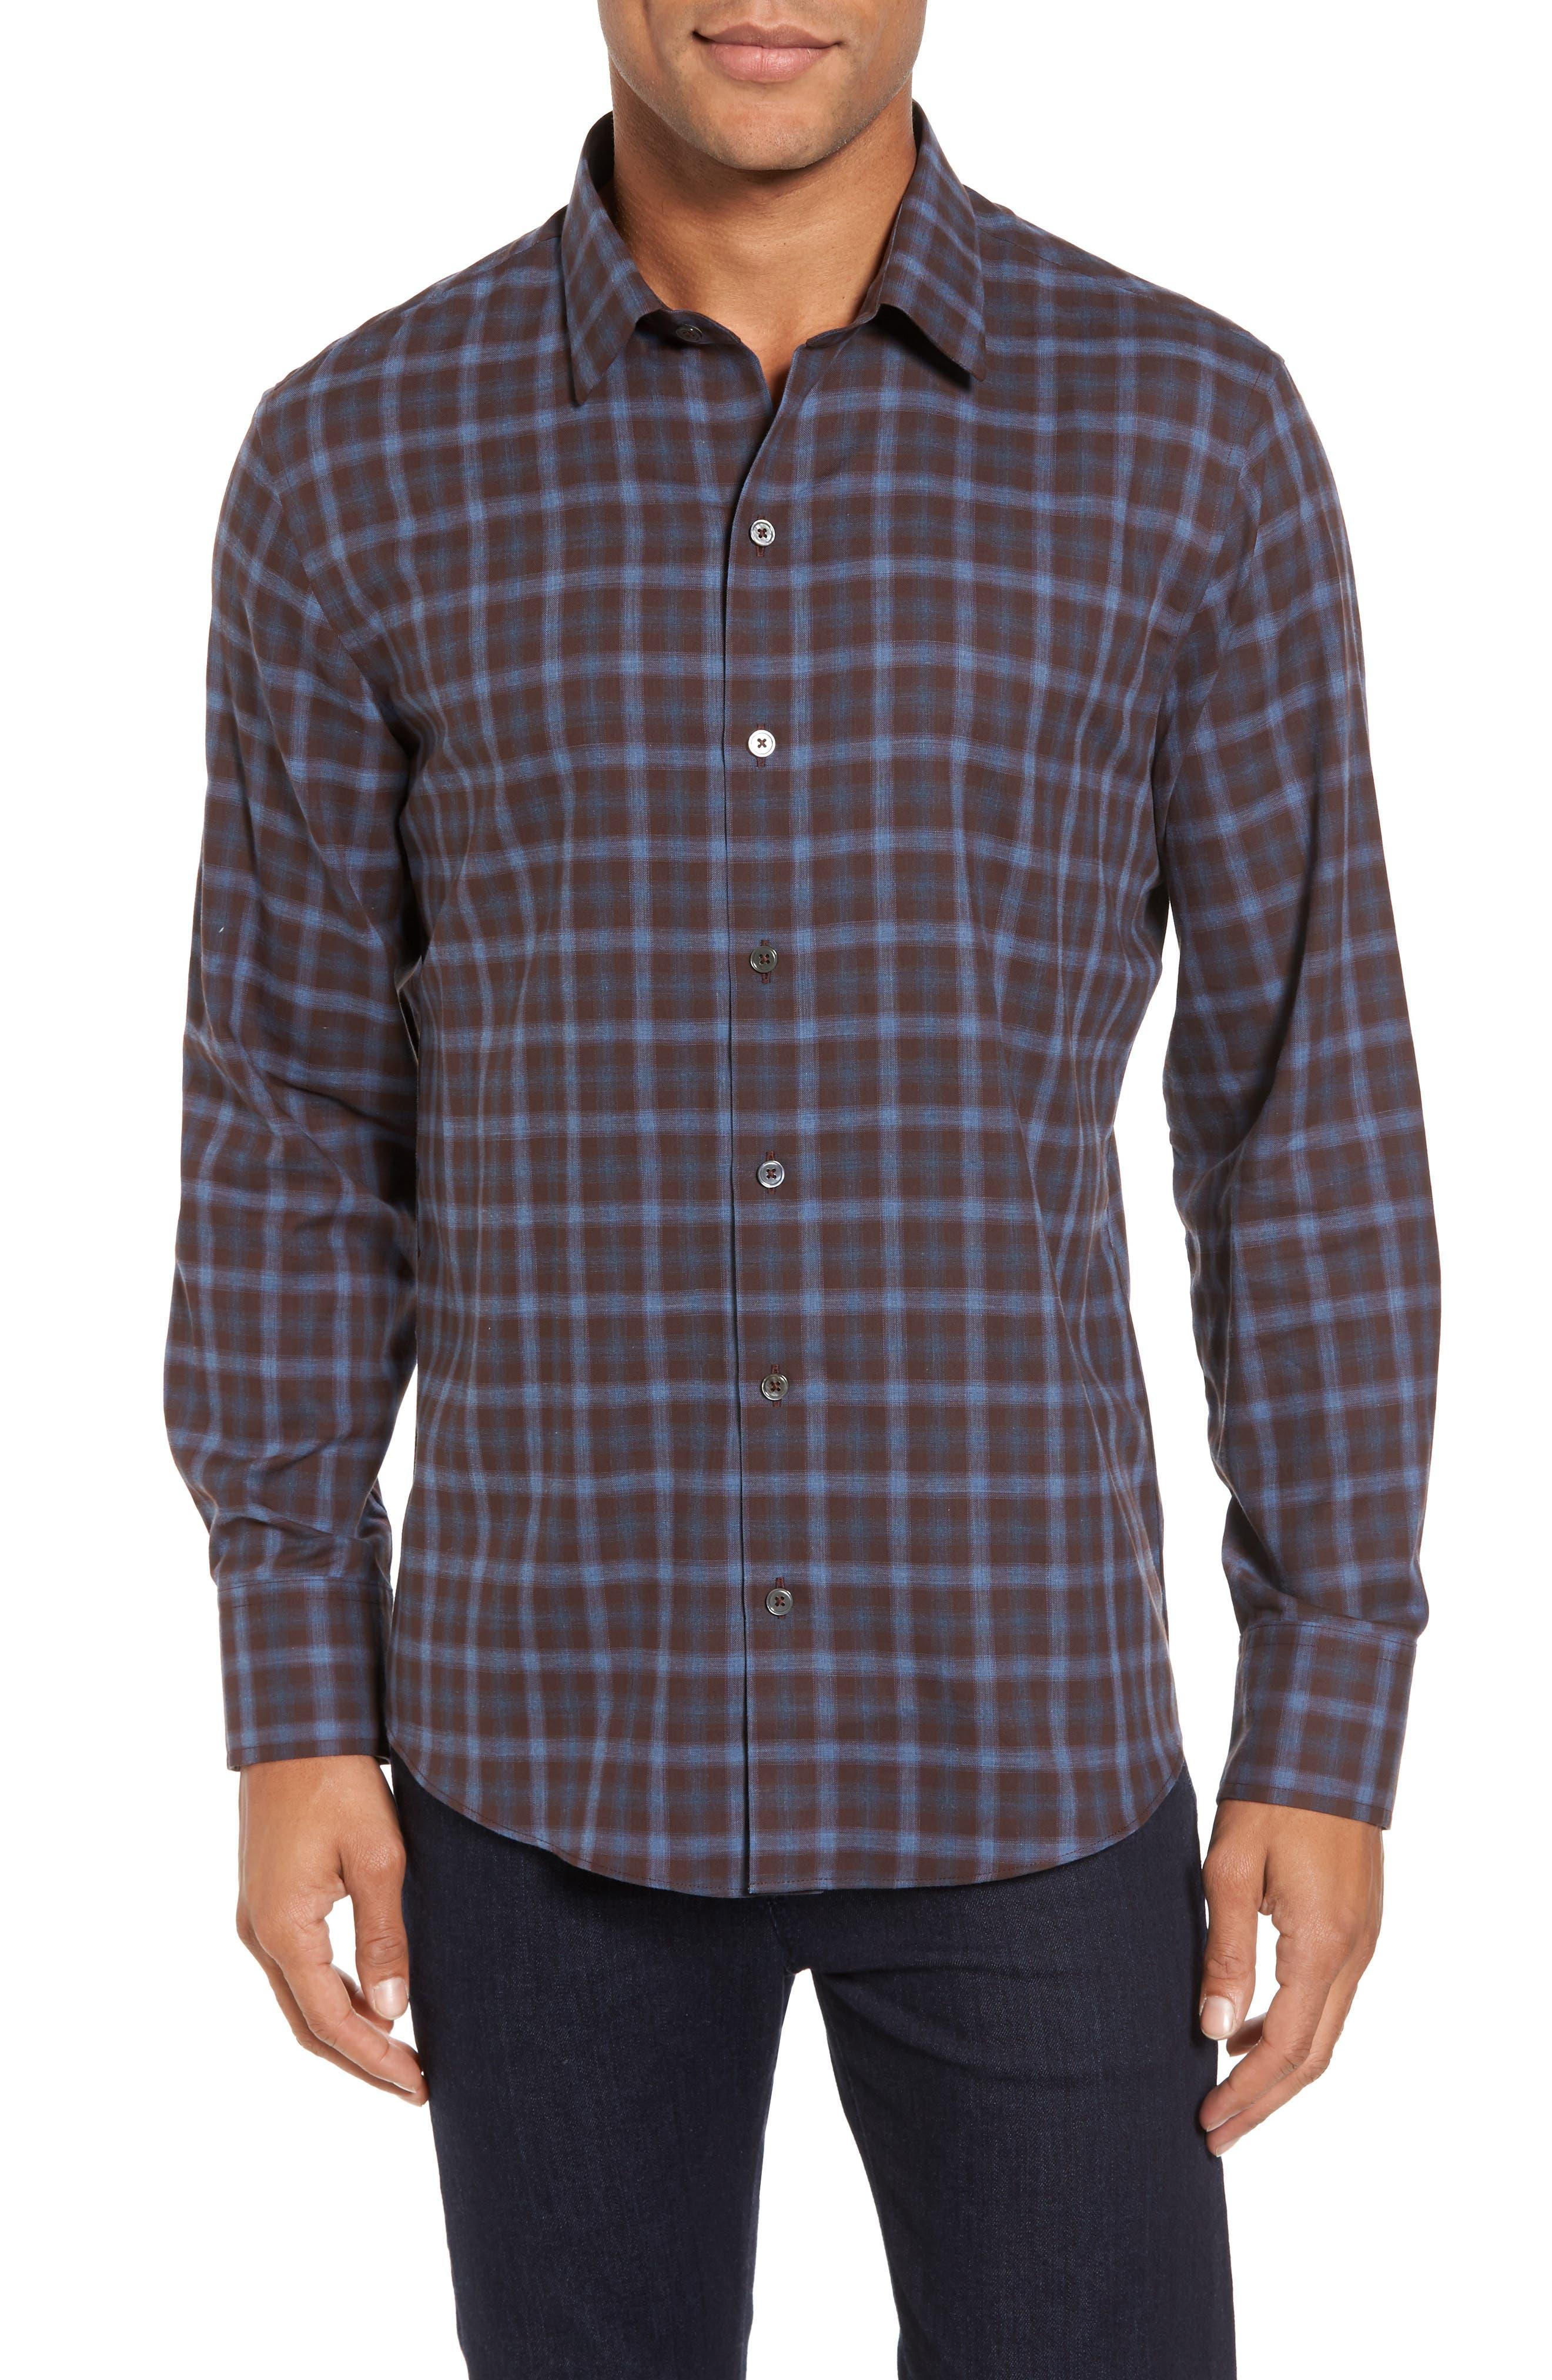 Main Image - Zachary Prell Fathollahi Slim Fit Plaid Sport Shirt